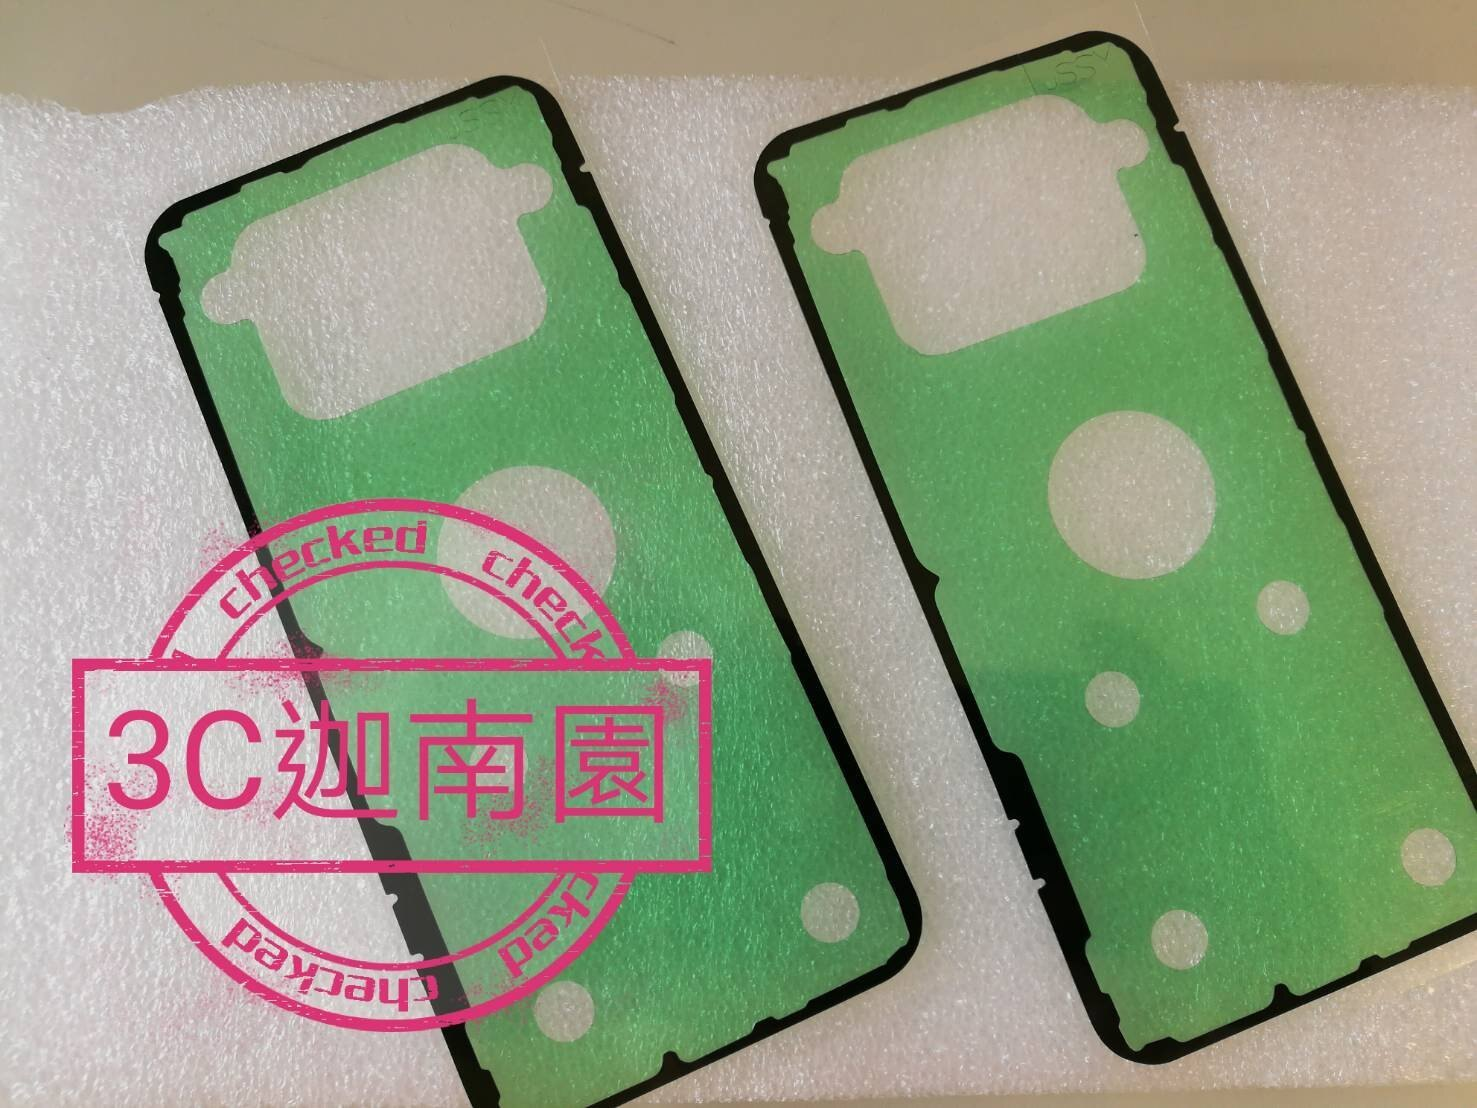 【3M IP防水級】三星 Samsung Galaxy S8 原廠膠 背膠 背蓋黏膠 電池 背蓋 防水膠條